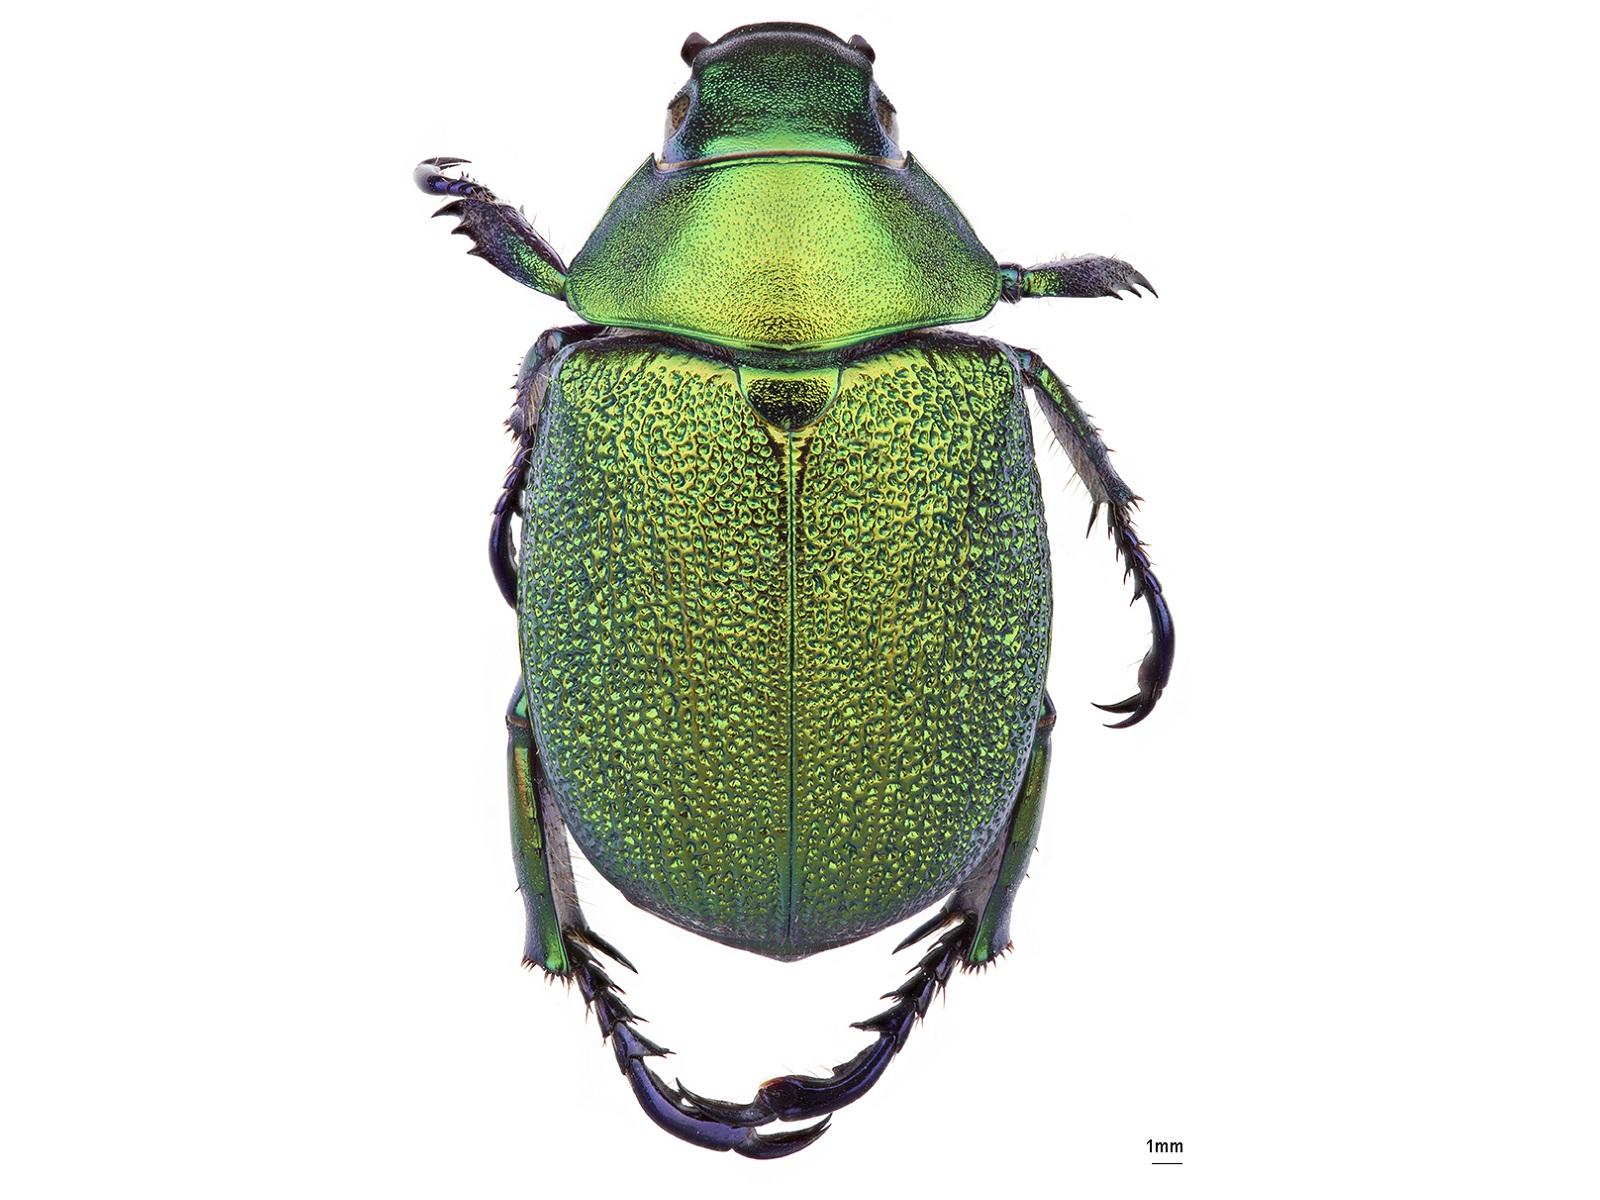 Chrysophora chrysochlora (Latreille, 1811)